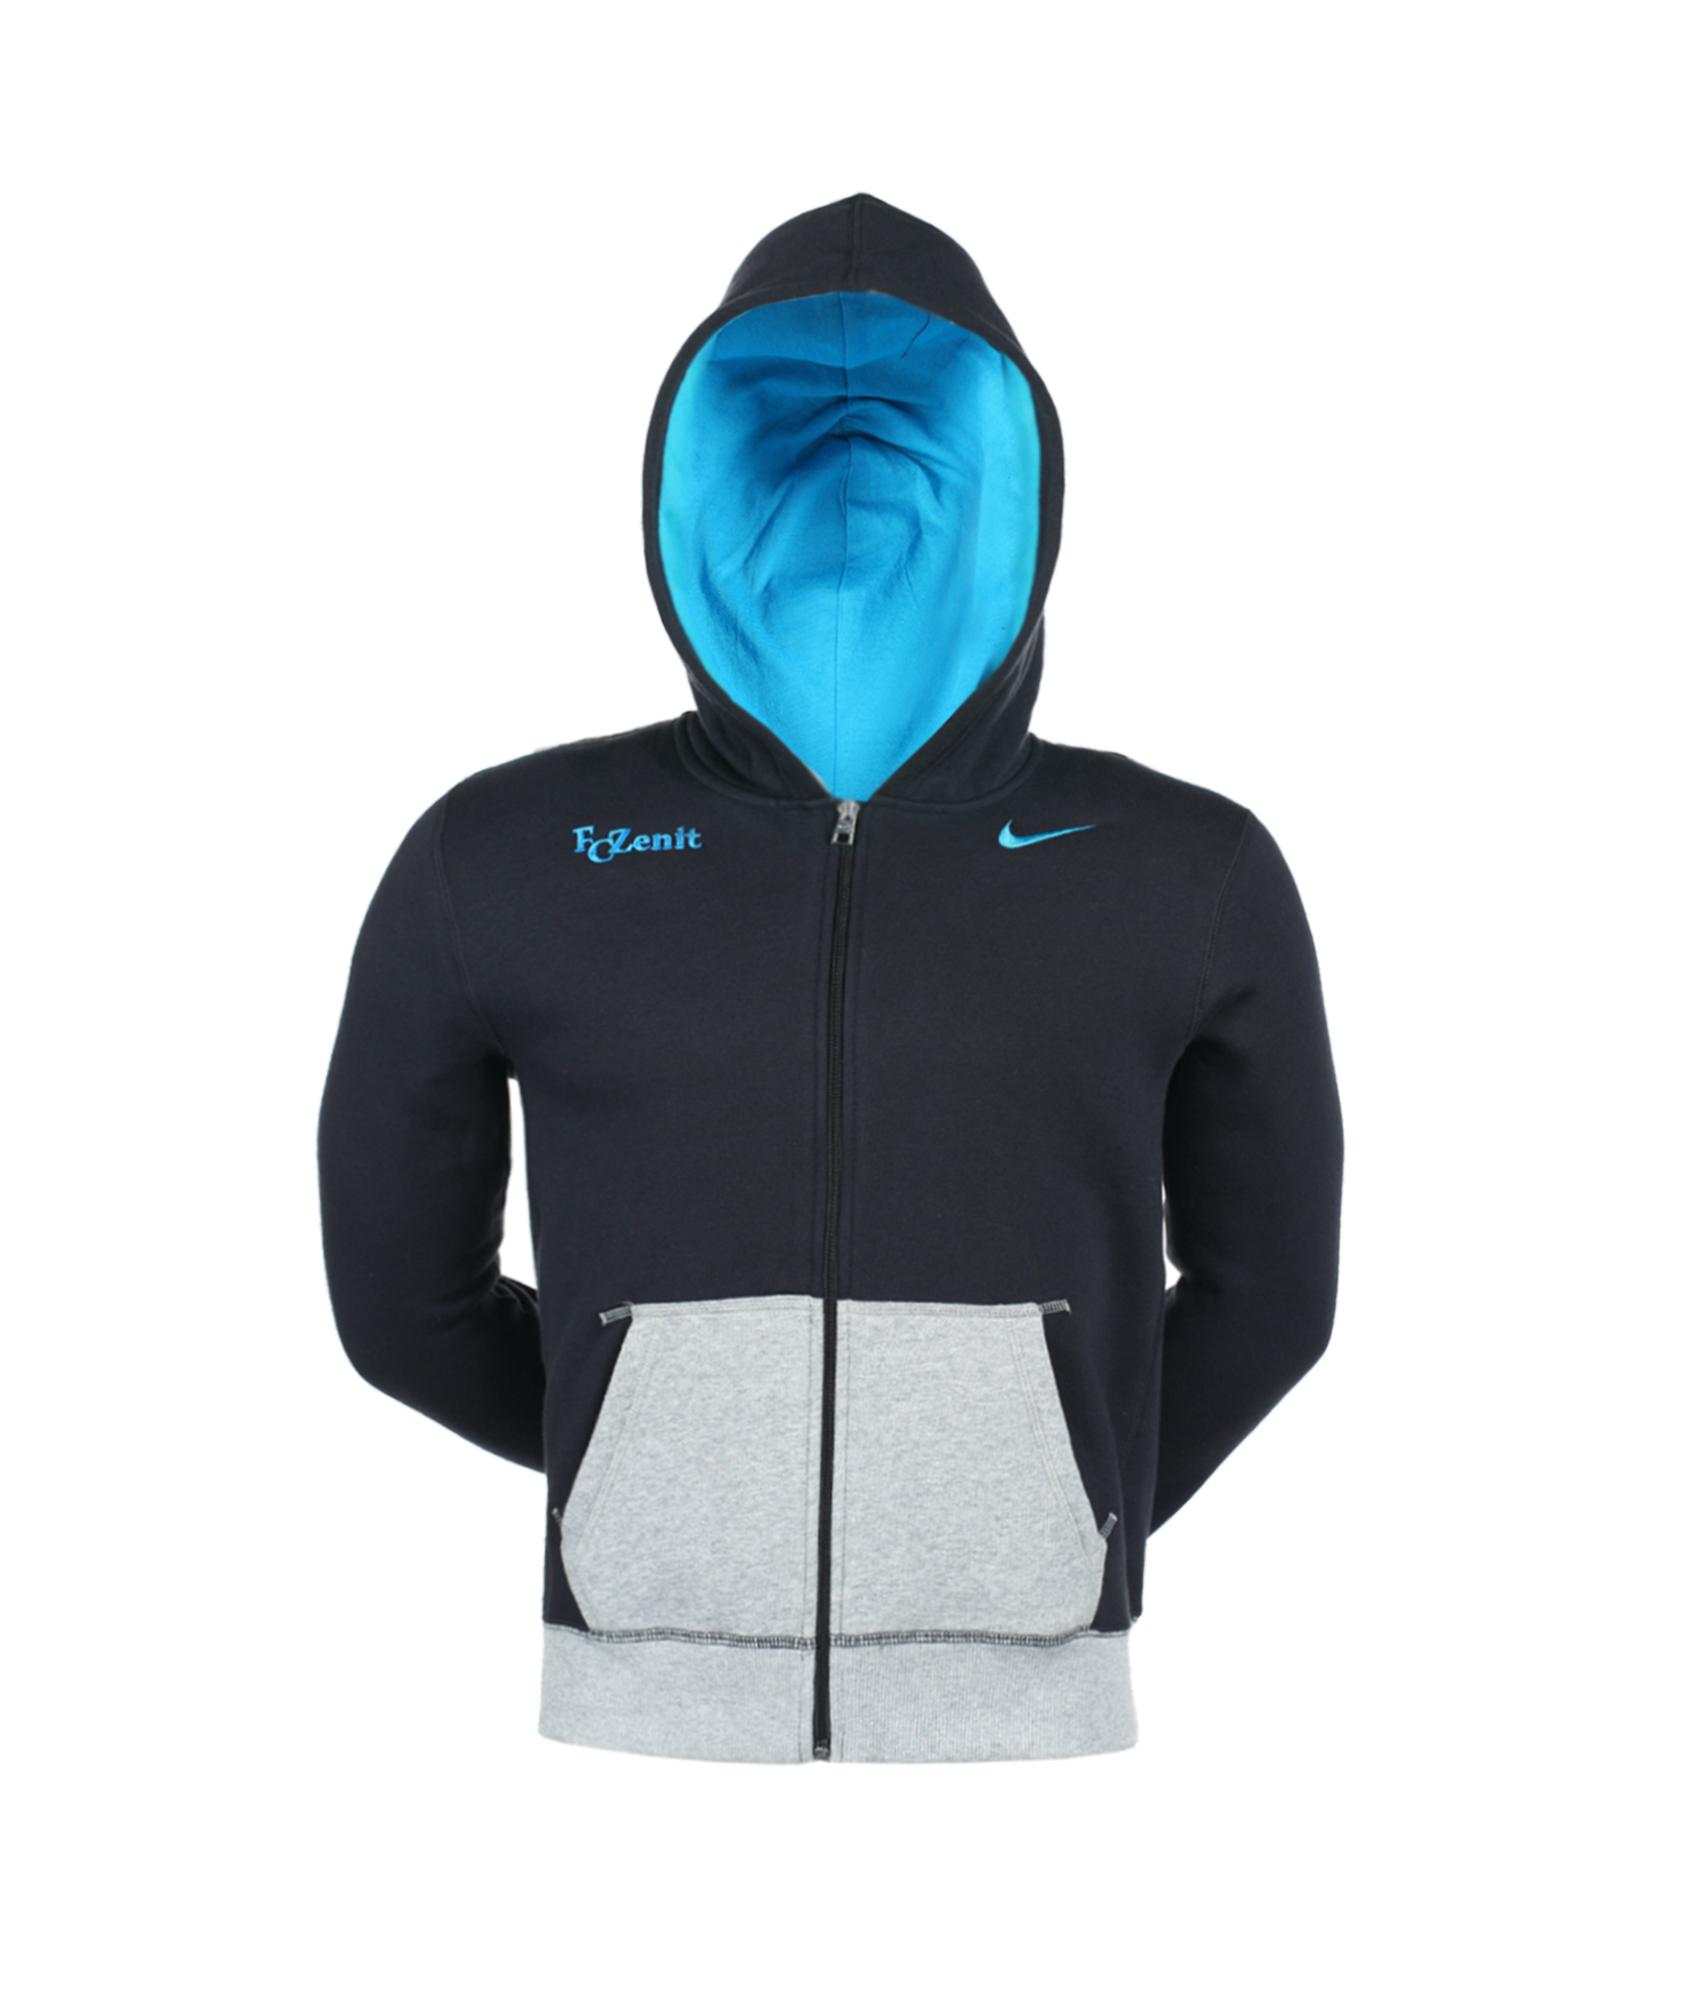 Толстовка Nike YA76 BF FZ HDY-BK, Цвет-Черный, Размер-XL